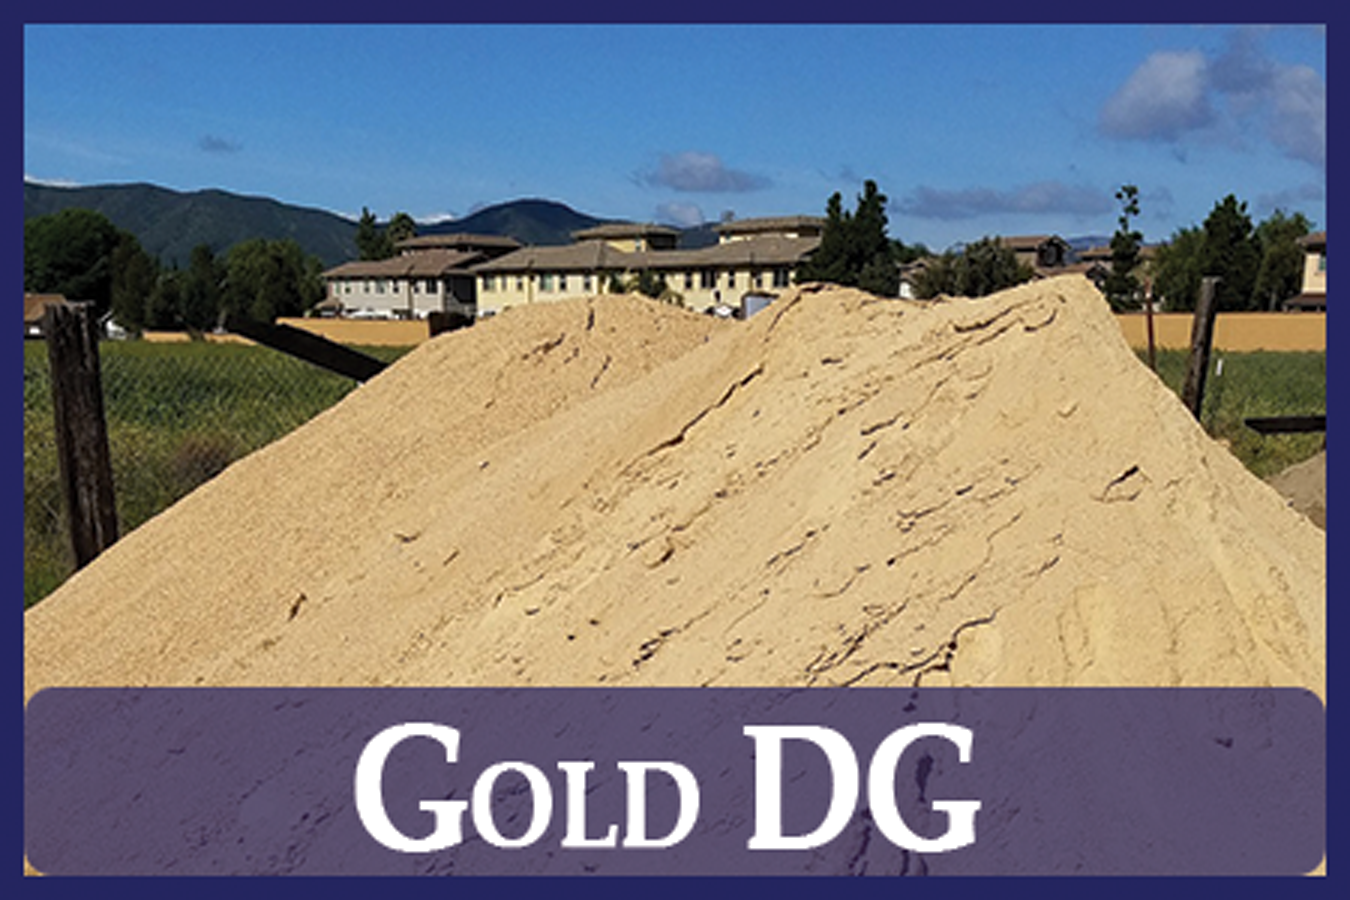 Gold DG